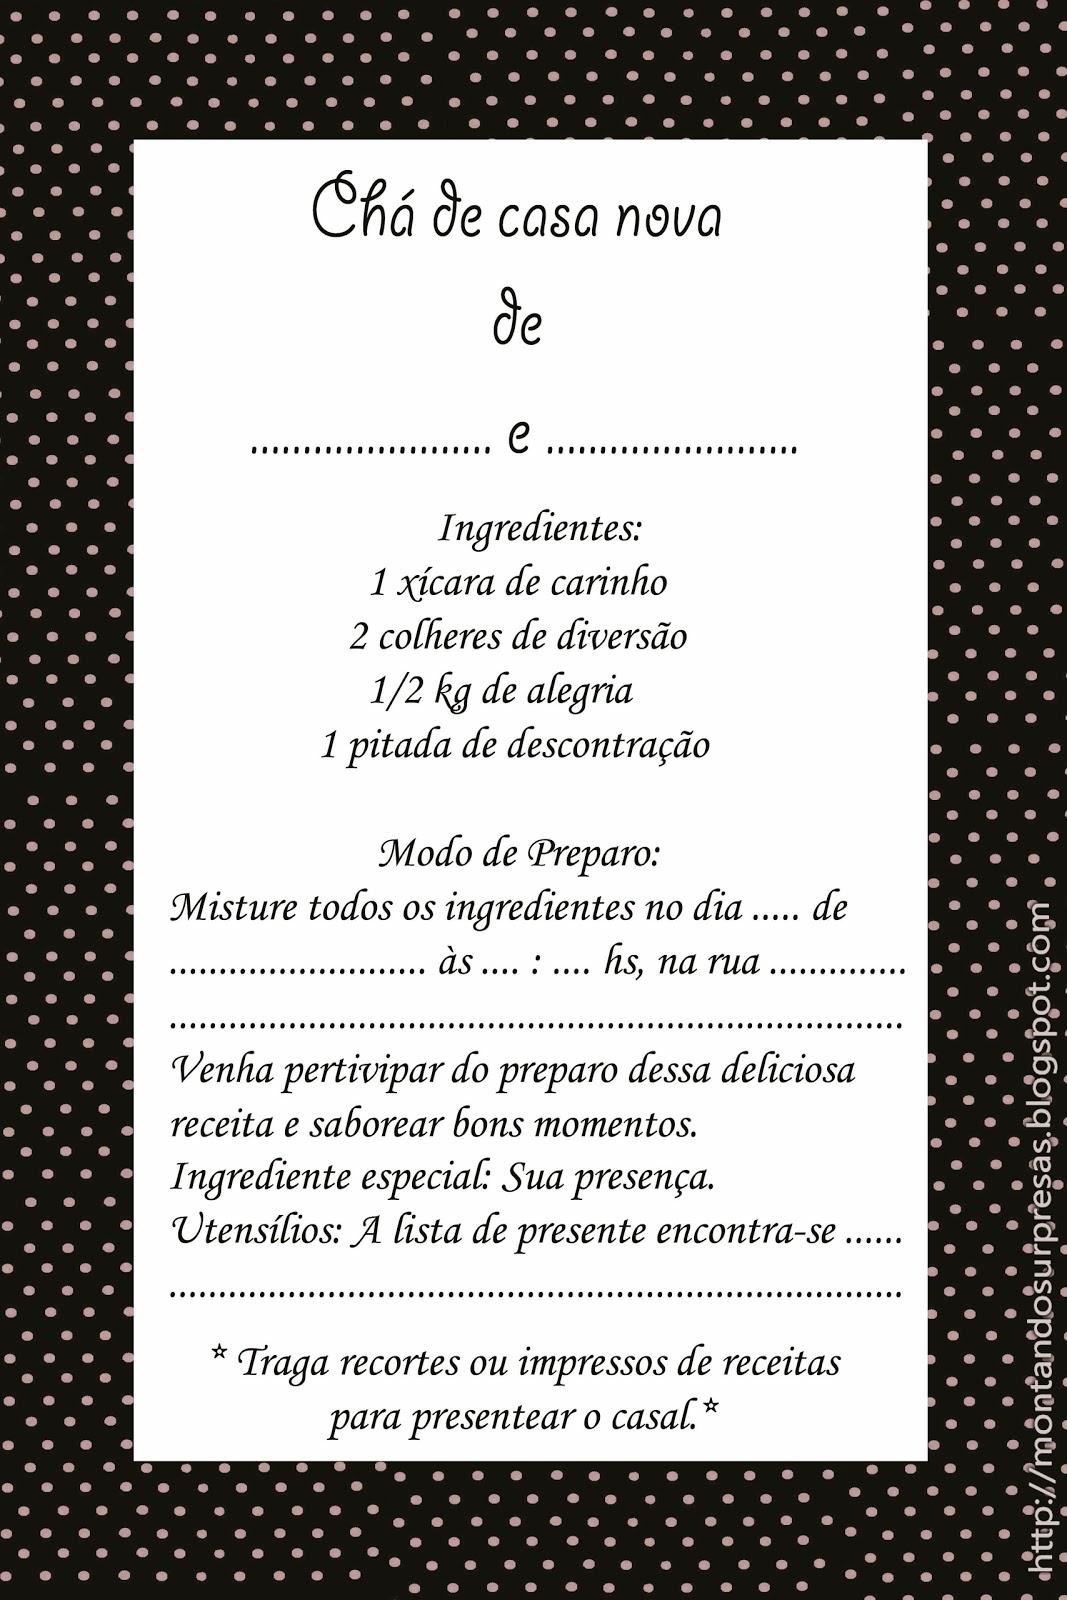 Jessica Valle Jessicavalle758 On Pinterest ~ Lista Chá De Cozinha Pronta